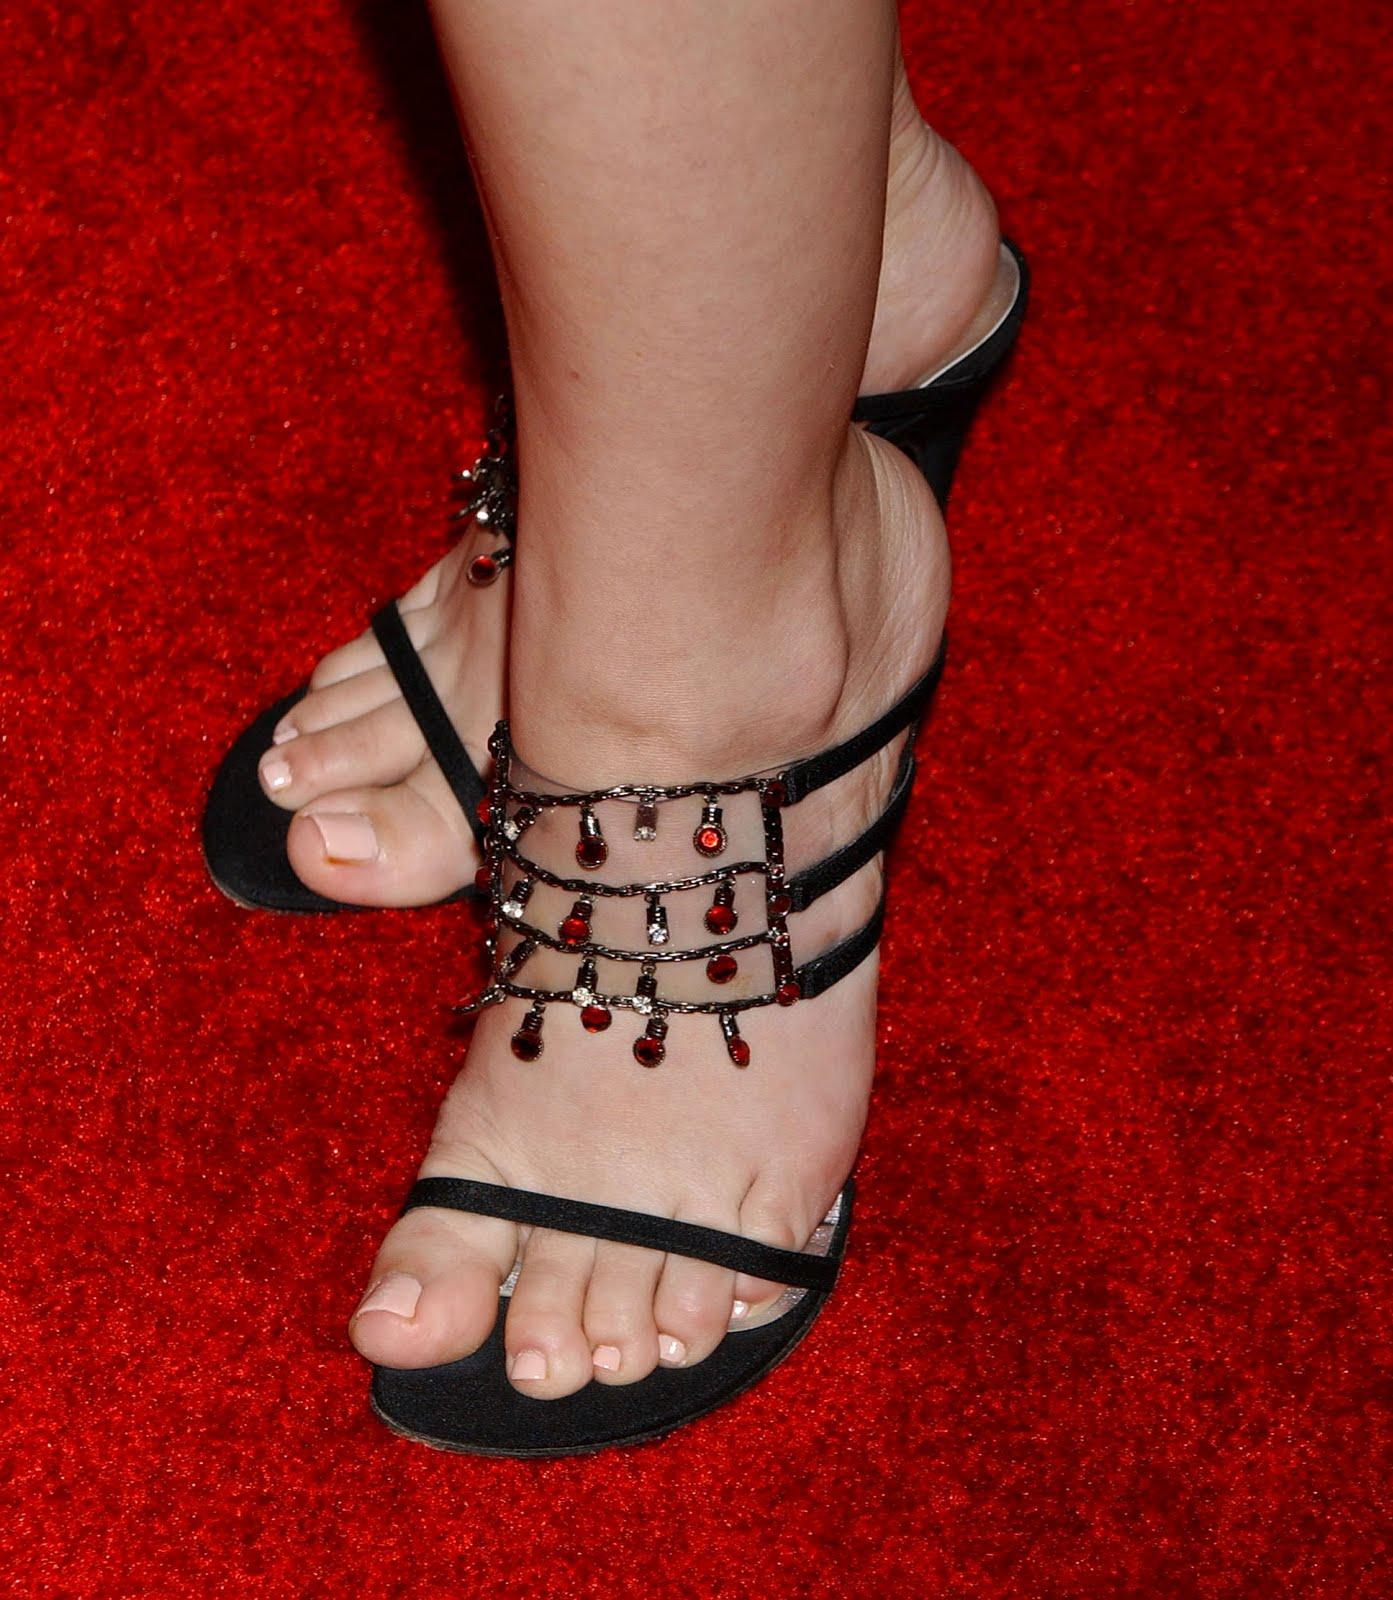 http://2.bp.blogspot.com/_UaLWp72nij4/S6vD0DLwm3I/AAAAAAAAFPs/_yUB9mEYygM/s1600/courtney-peldon-feet-3.jpg